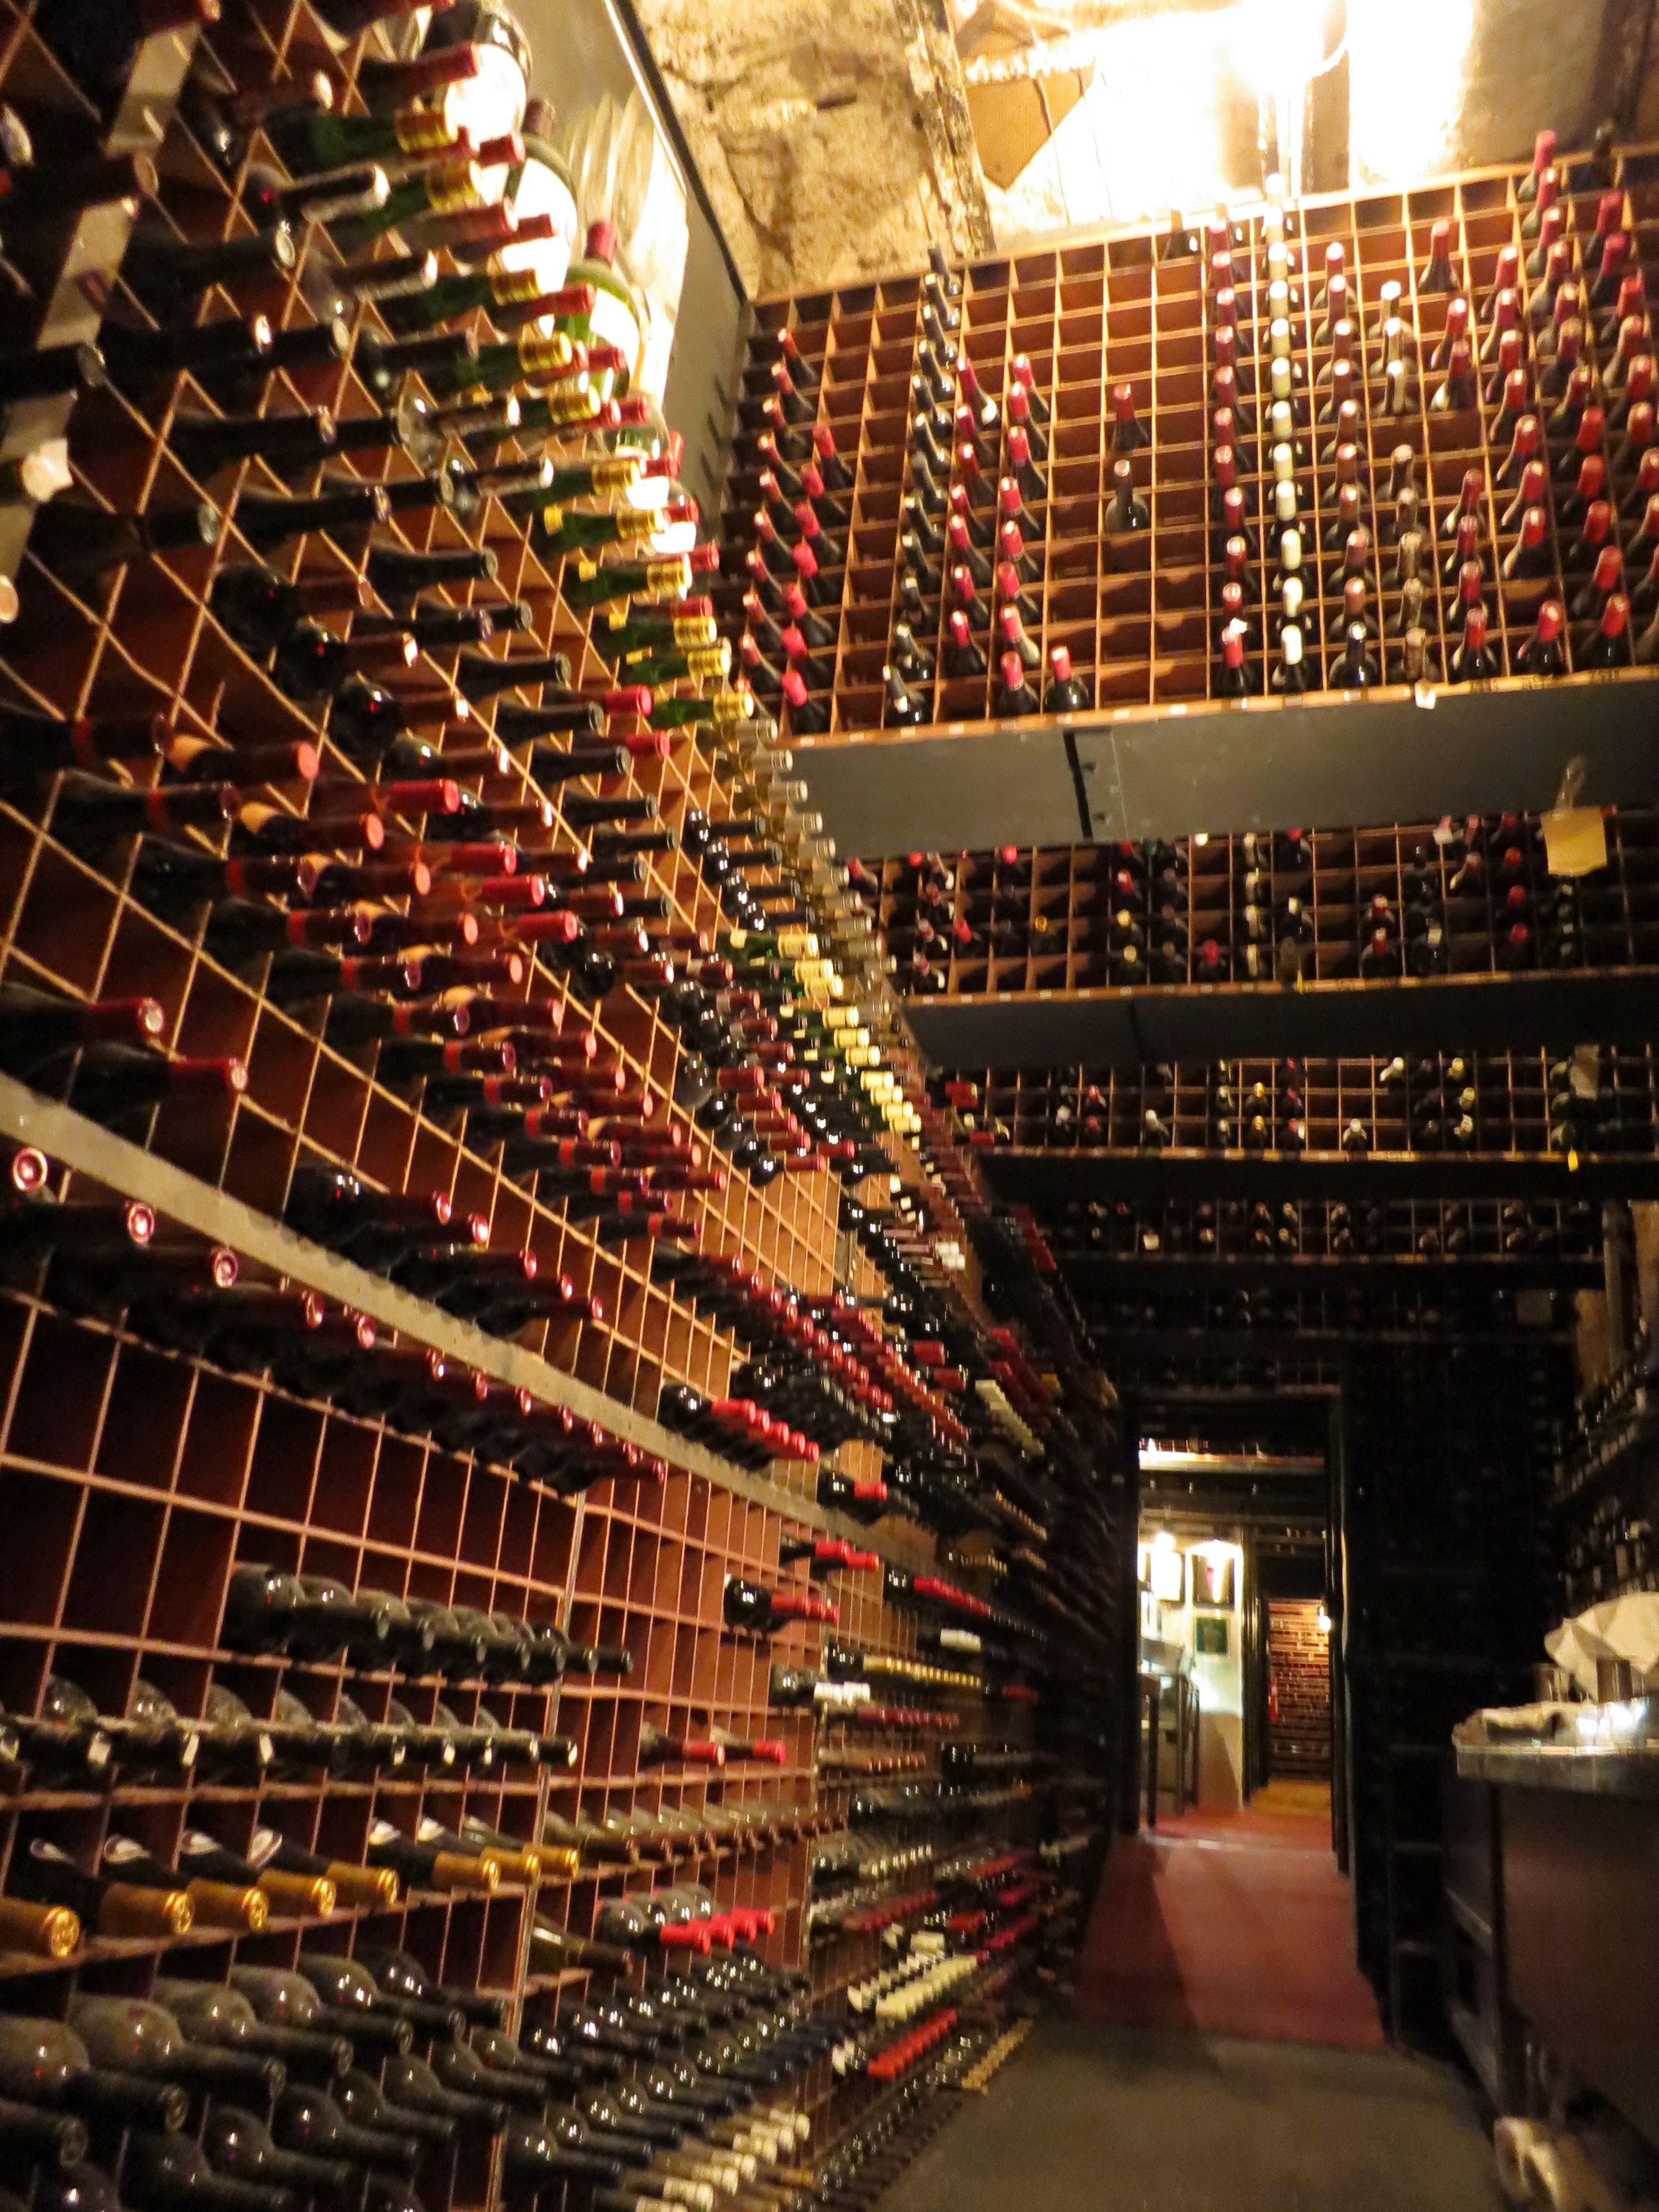 Wine Cellers - Wine Cellar 225X300 The Wine Cellar